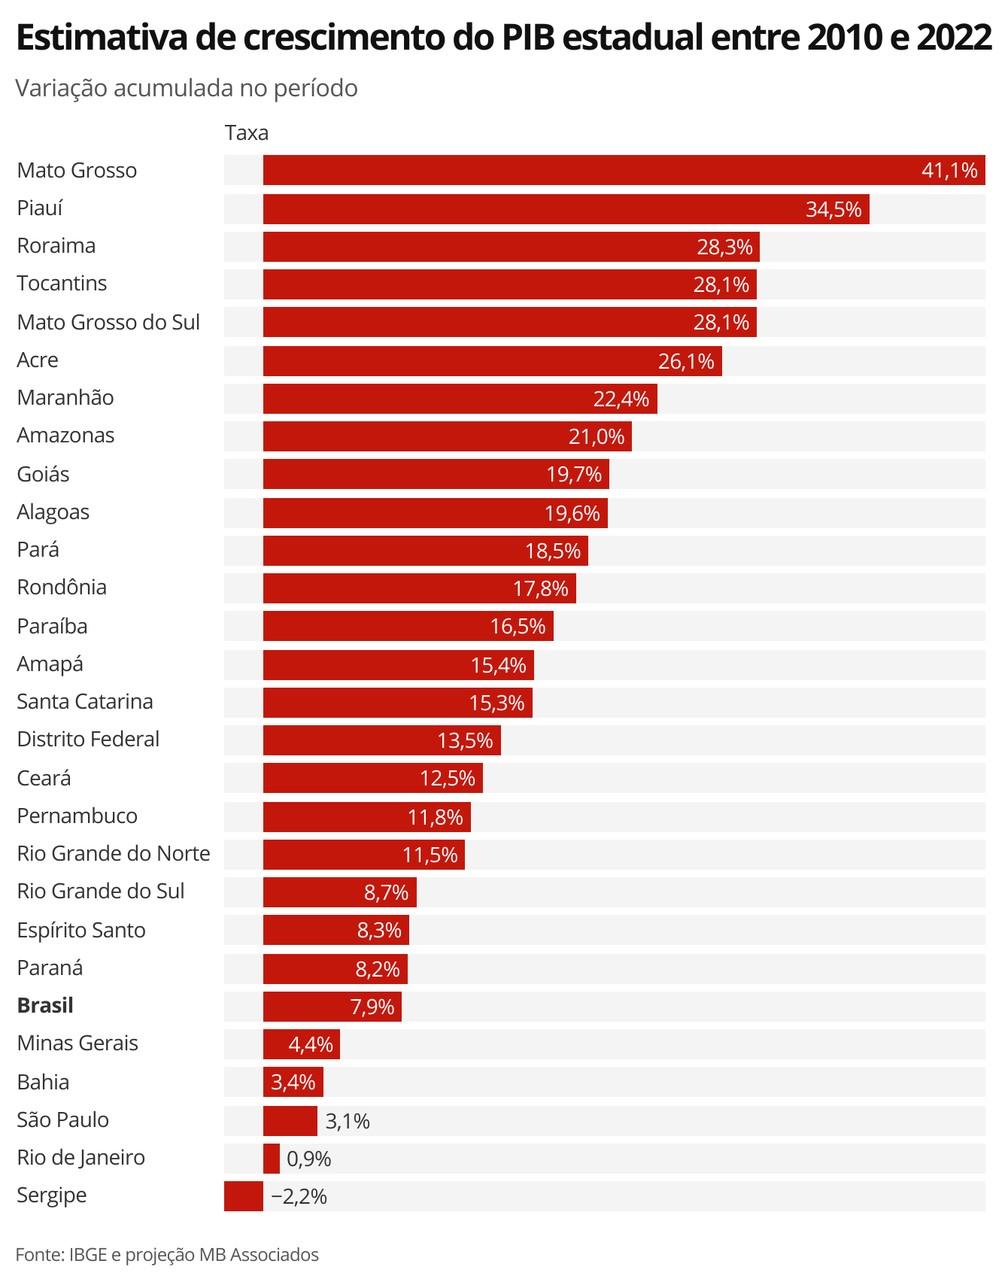 Estimativa de crescimento do PIB estadual entre 2010 e 2022 — Foto: Economia G1